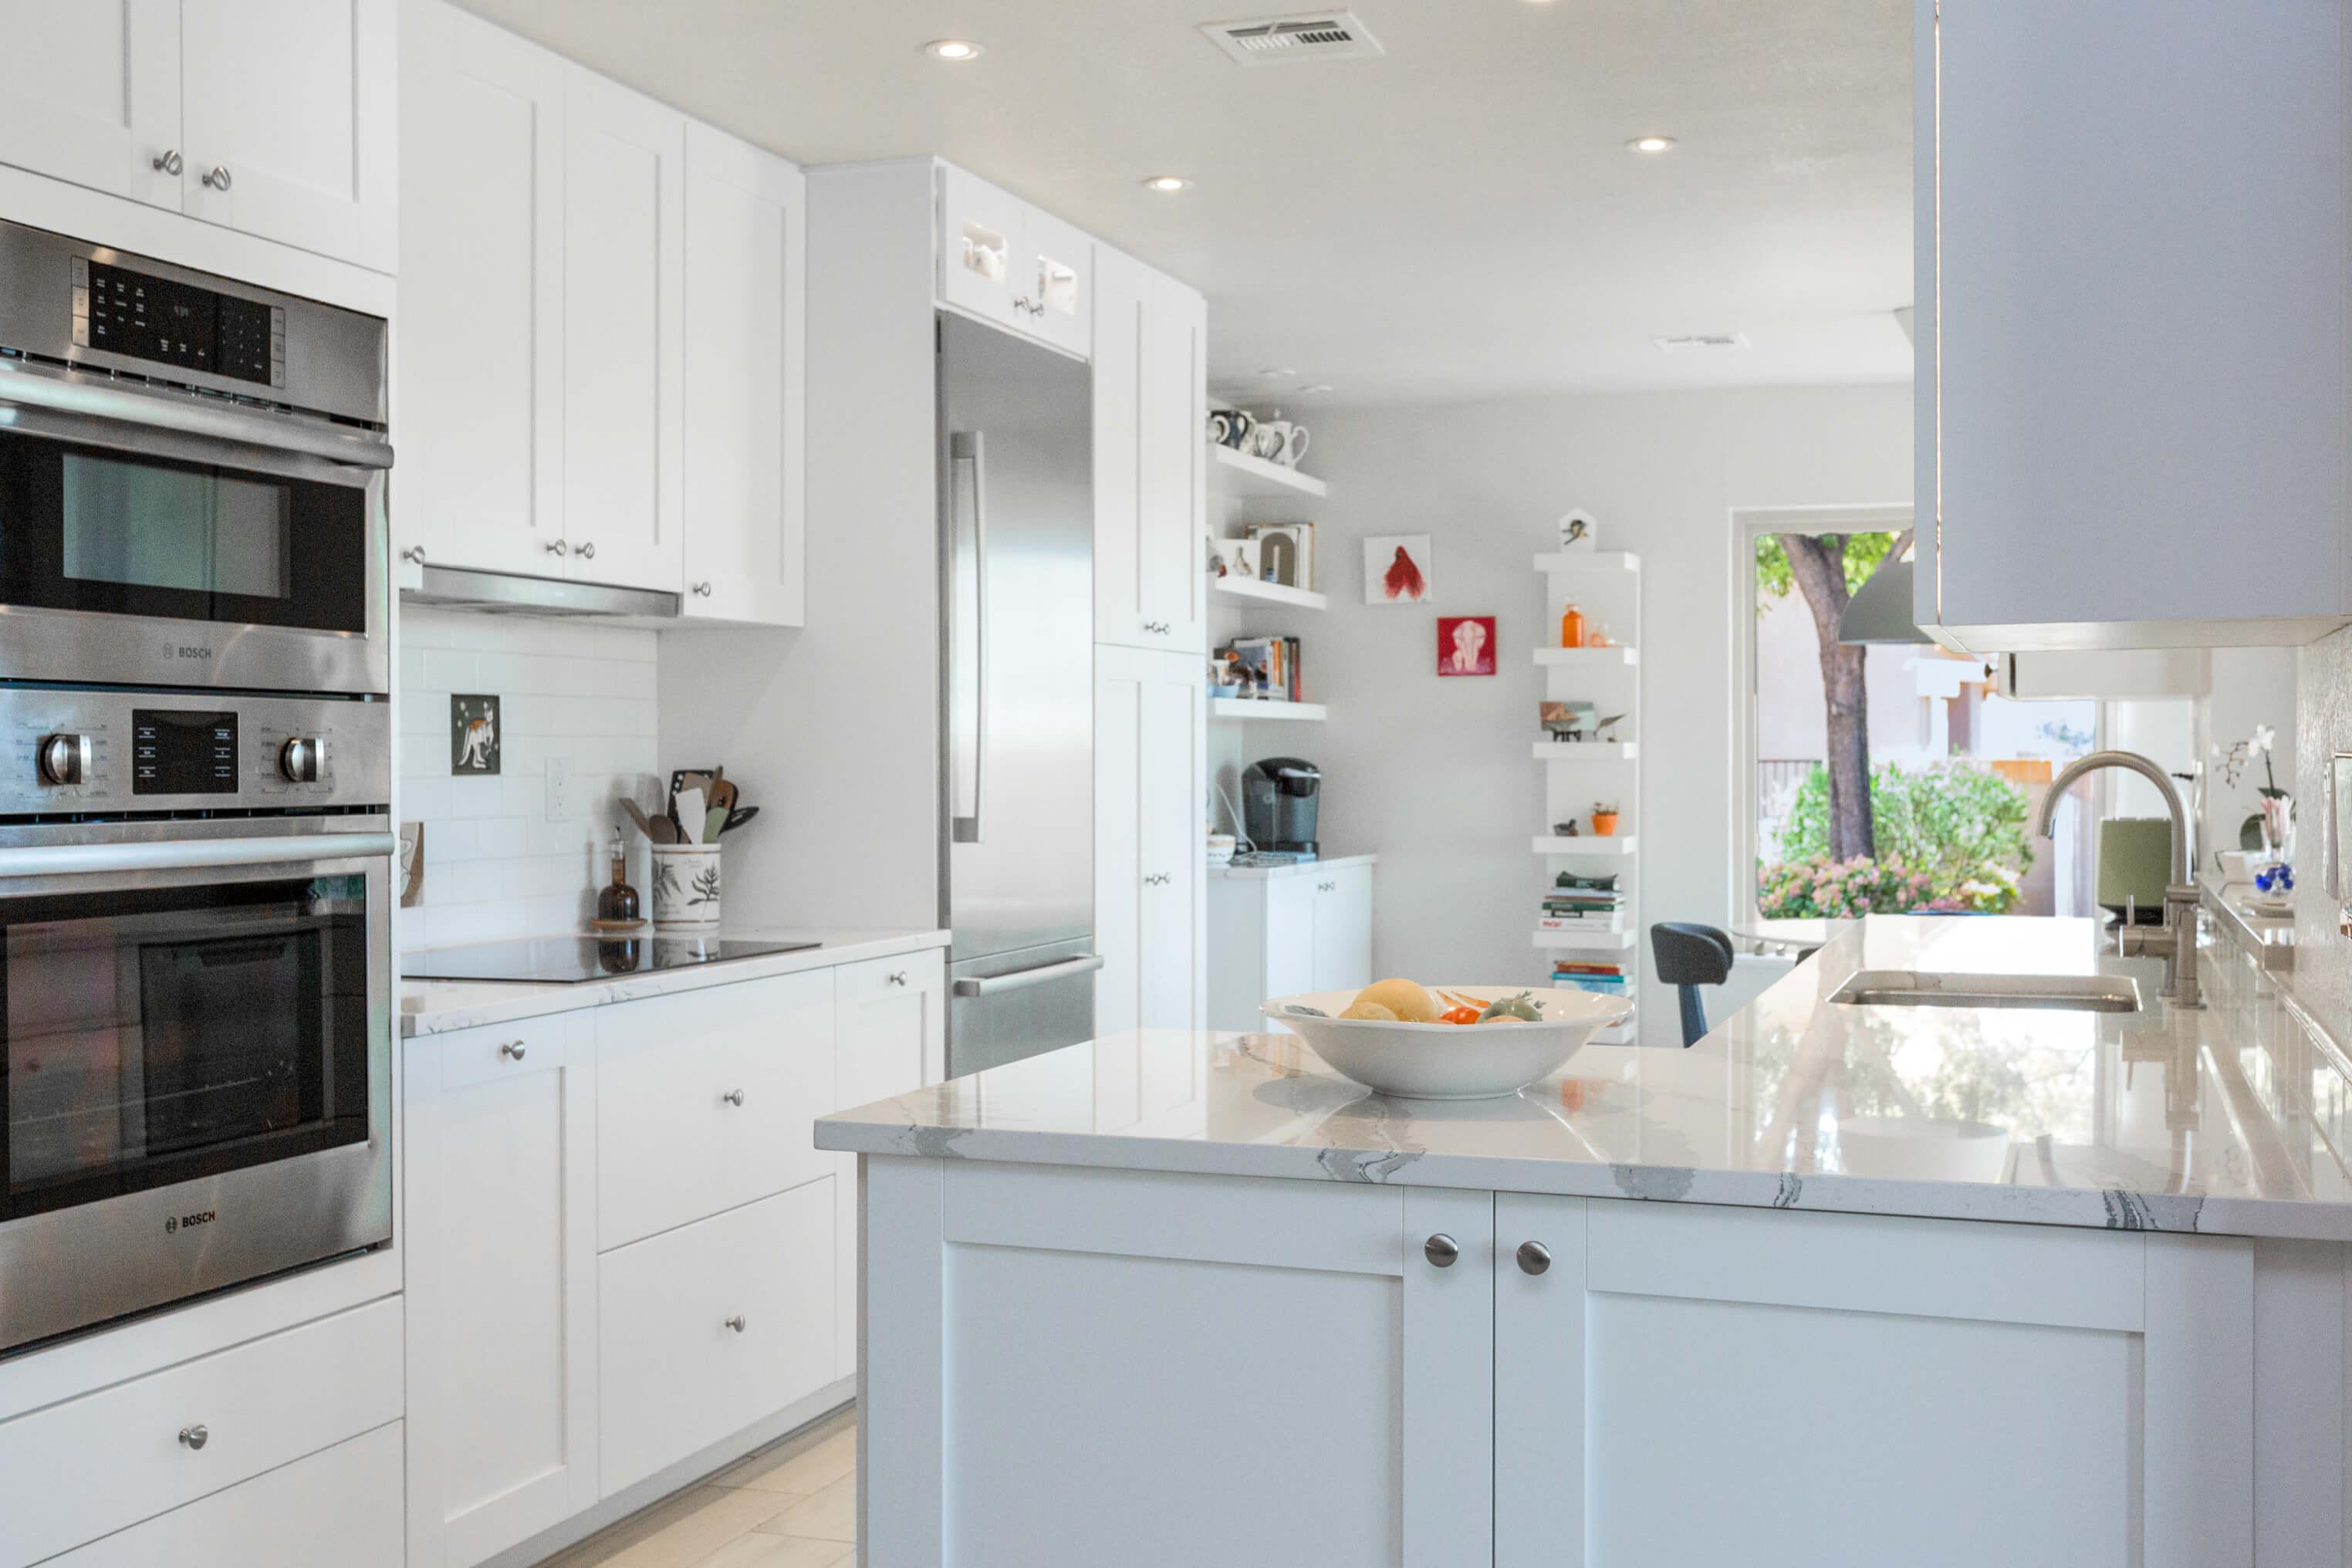 Sun city remodel designer laura wallace southwest kitchen for Southwest kitchen designs